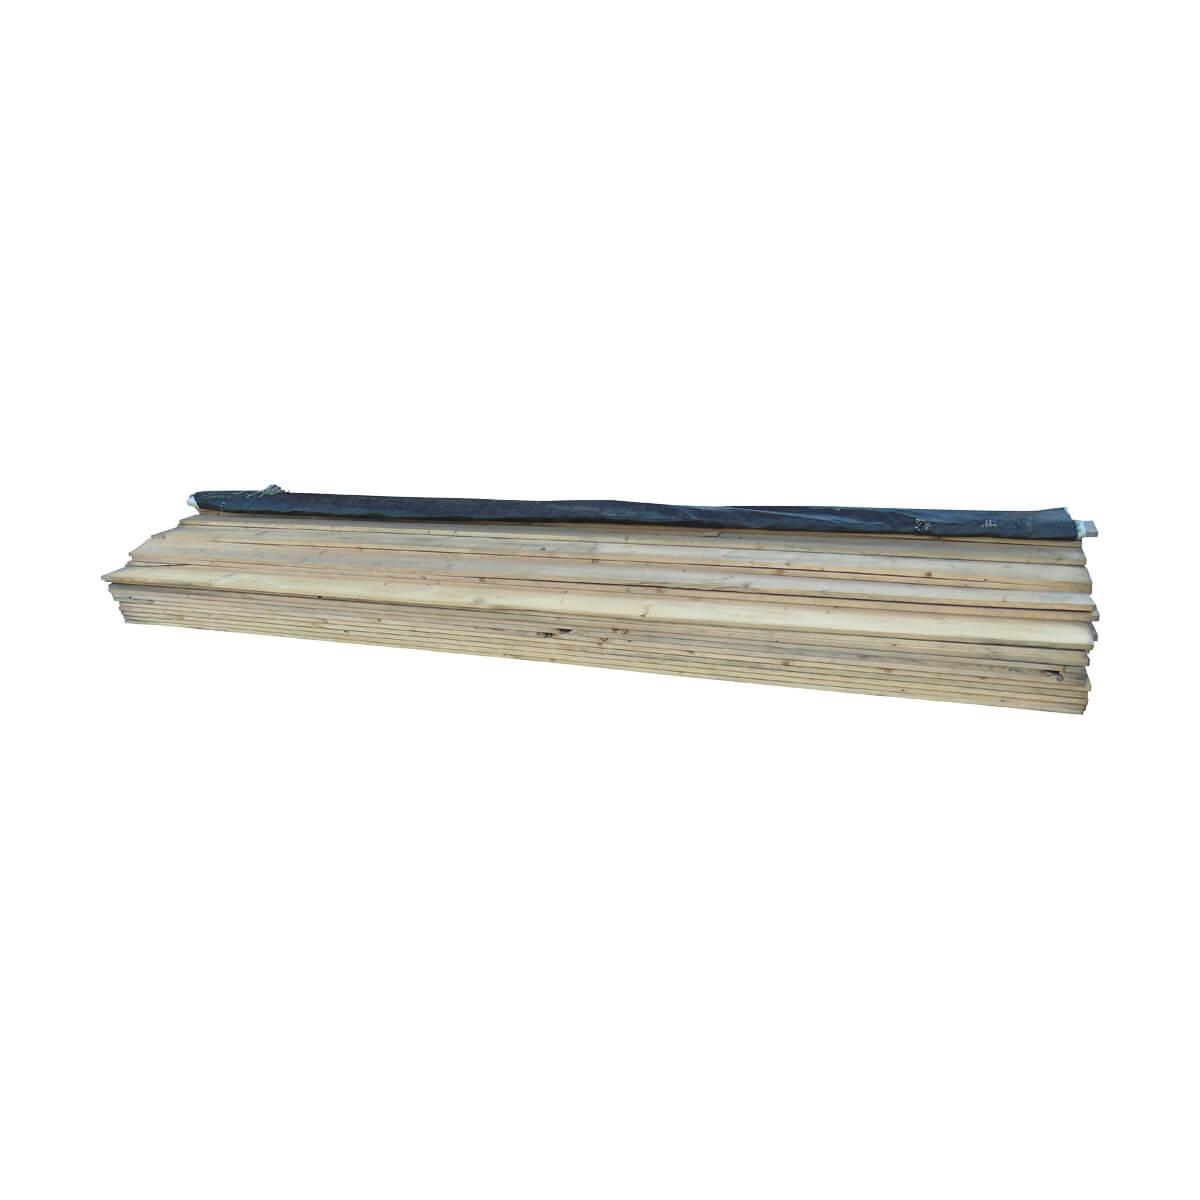 #3 Spruce Lumber - SPR #3 - 1 x 6 x 8-ft